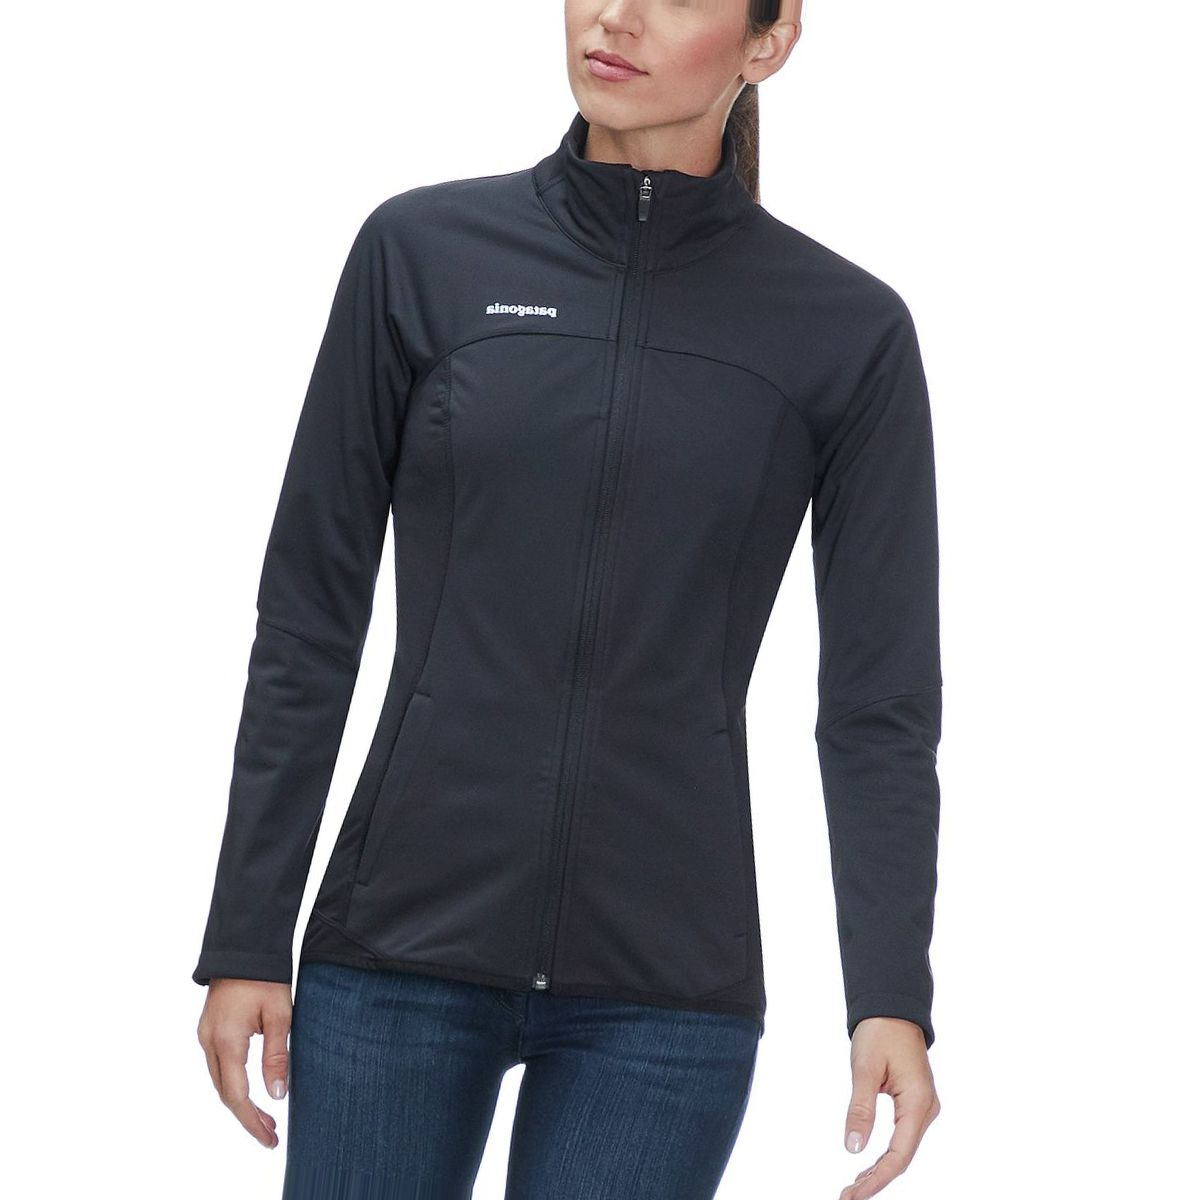 Patagonia Wind Shield Jacket - Women's